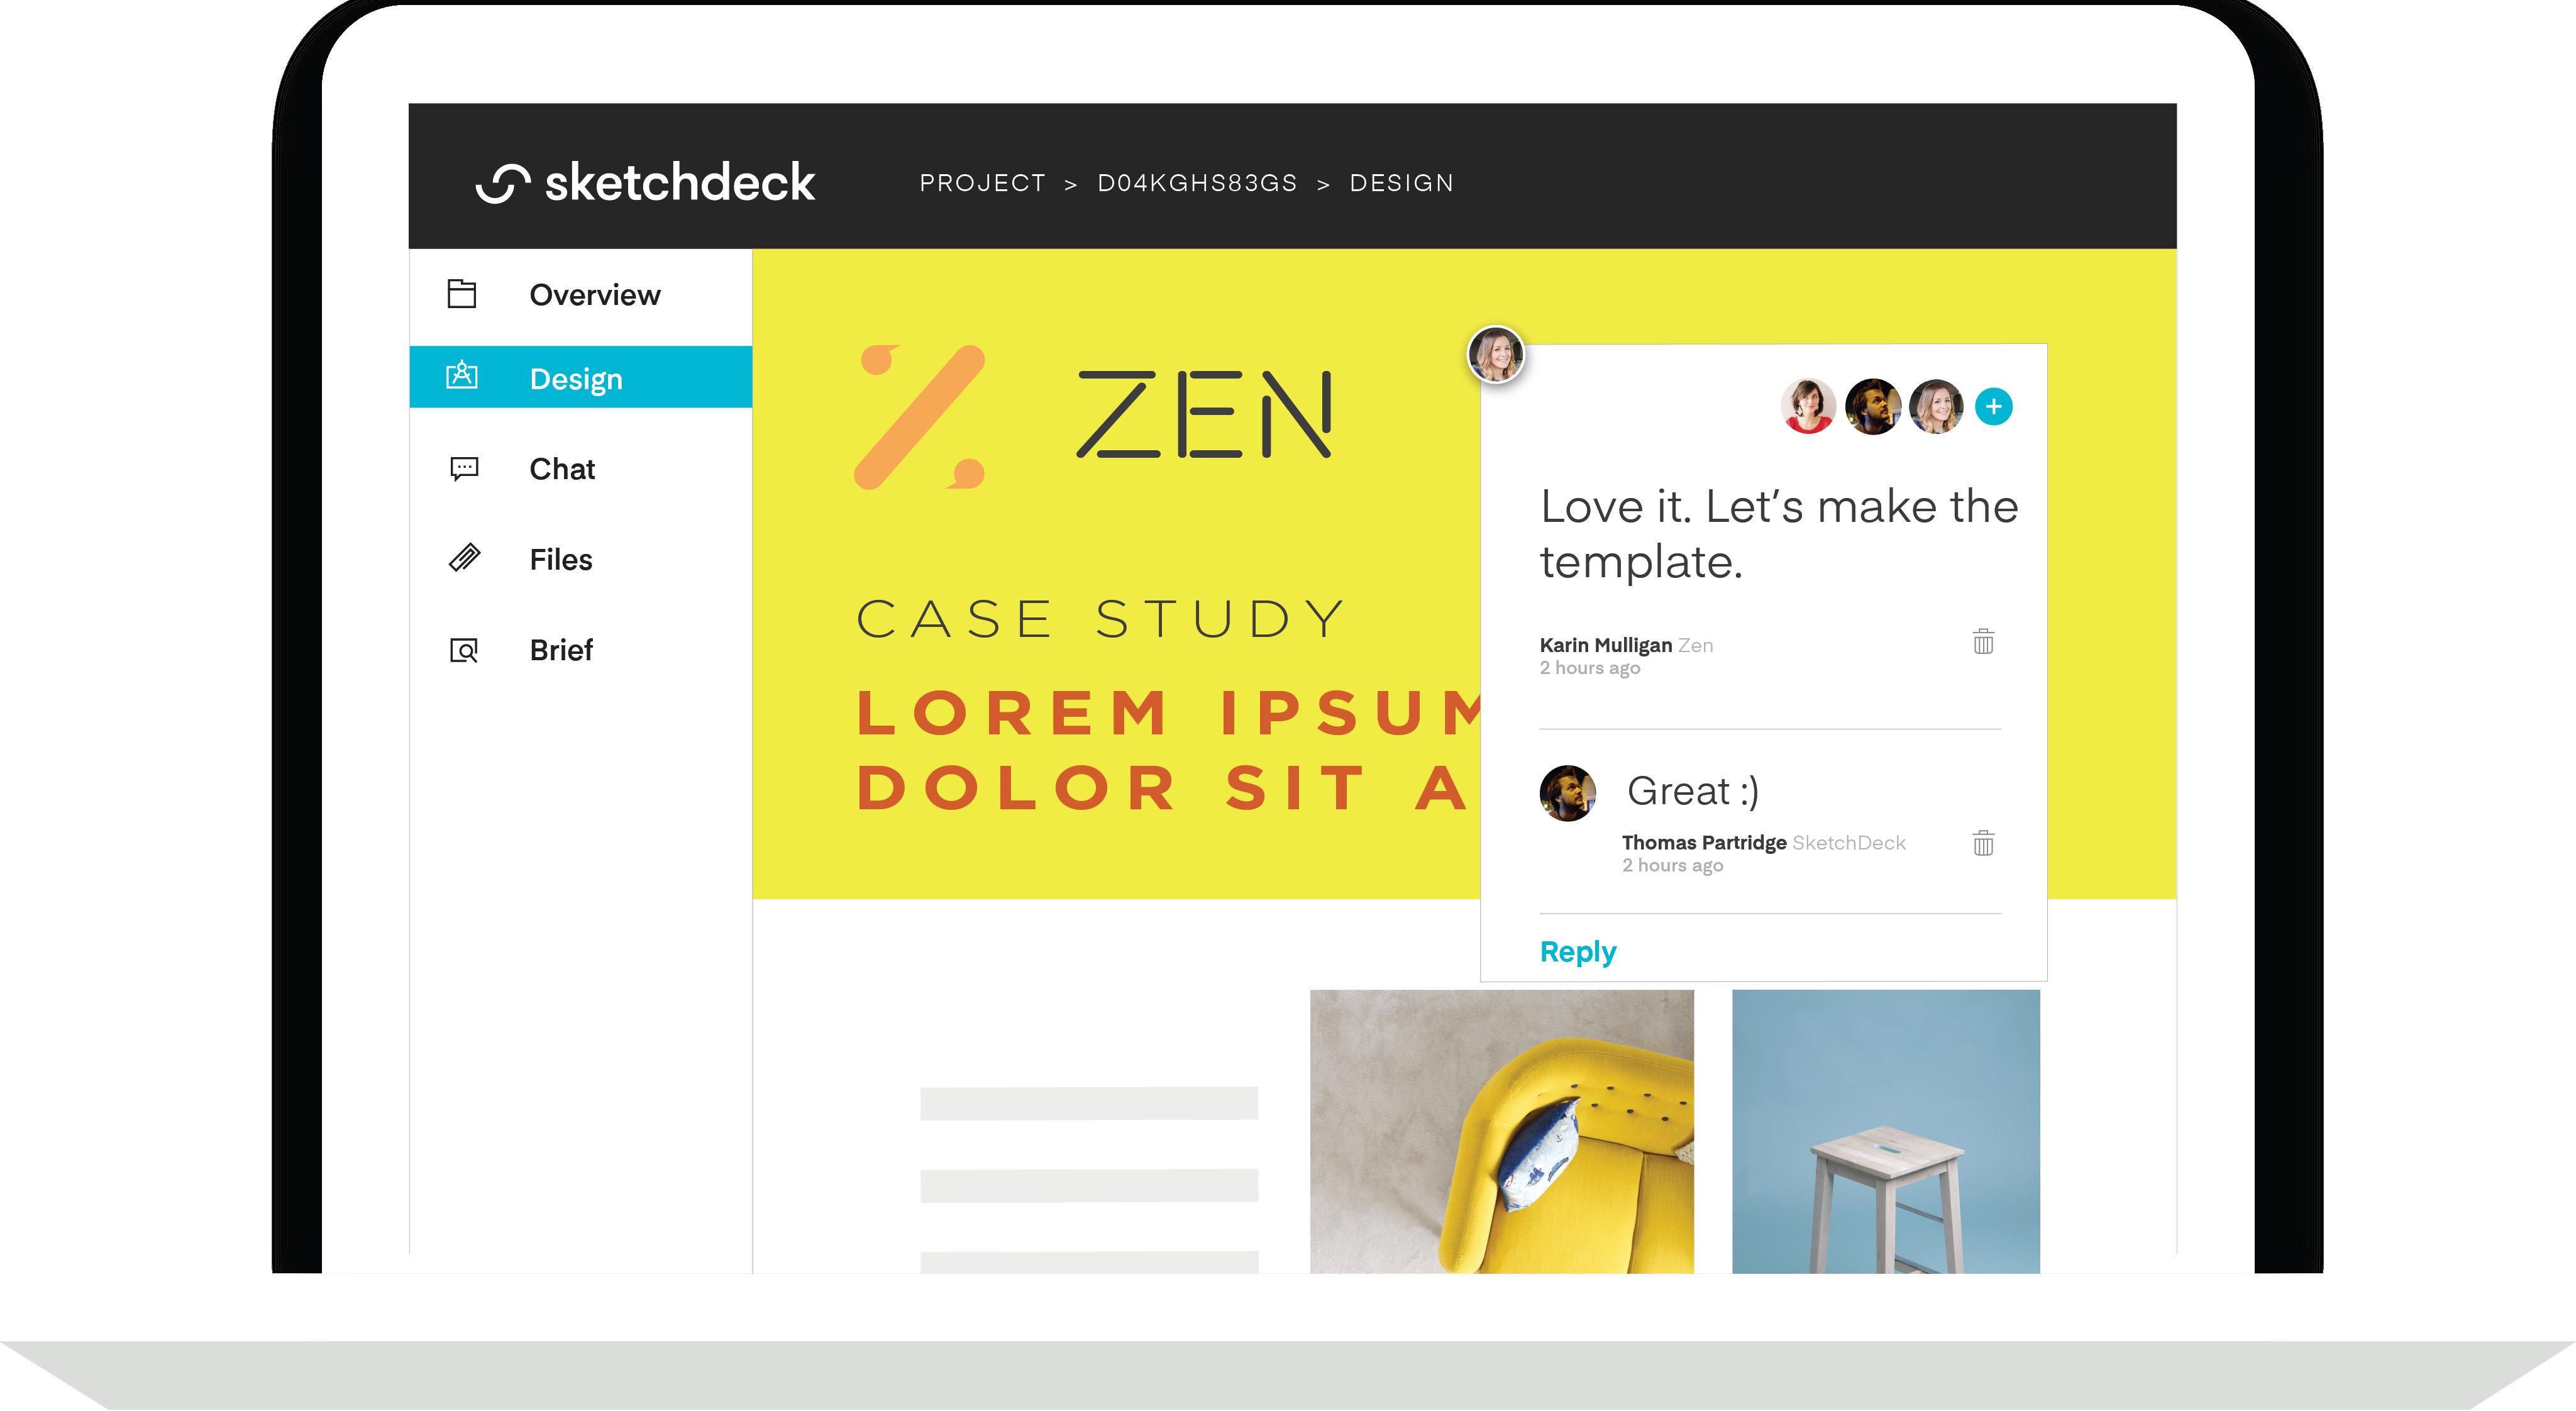 Mockup of the SketchDeck feedback system